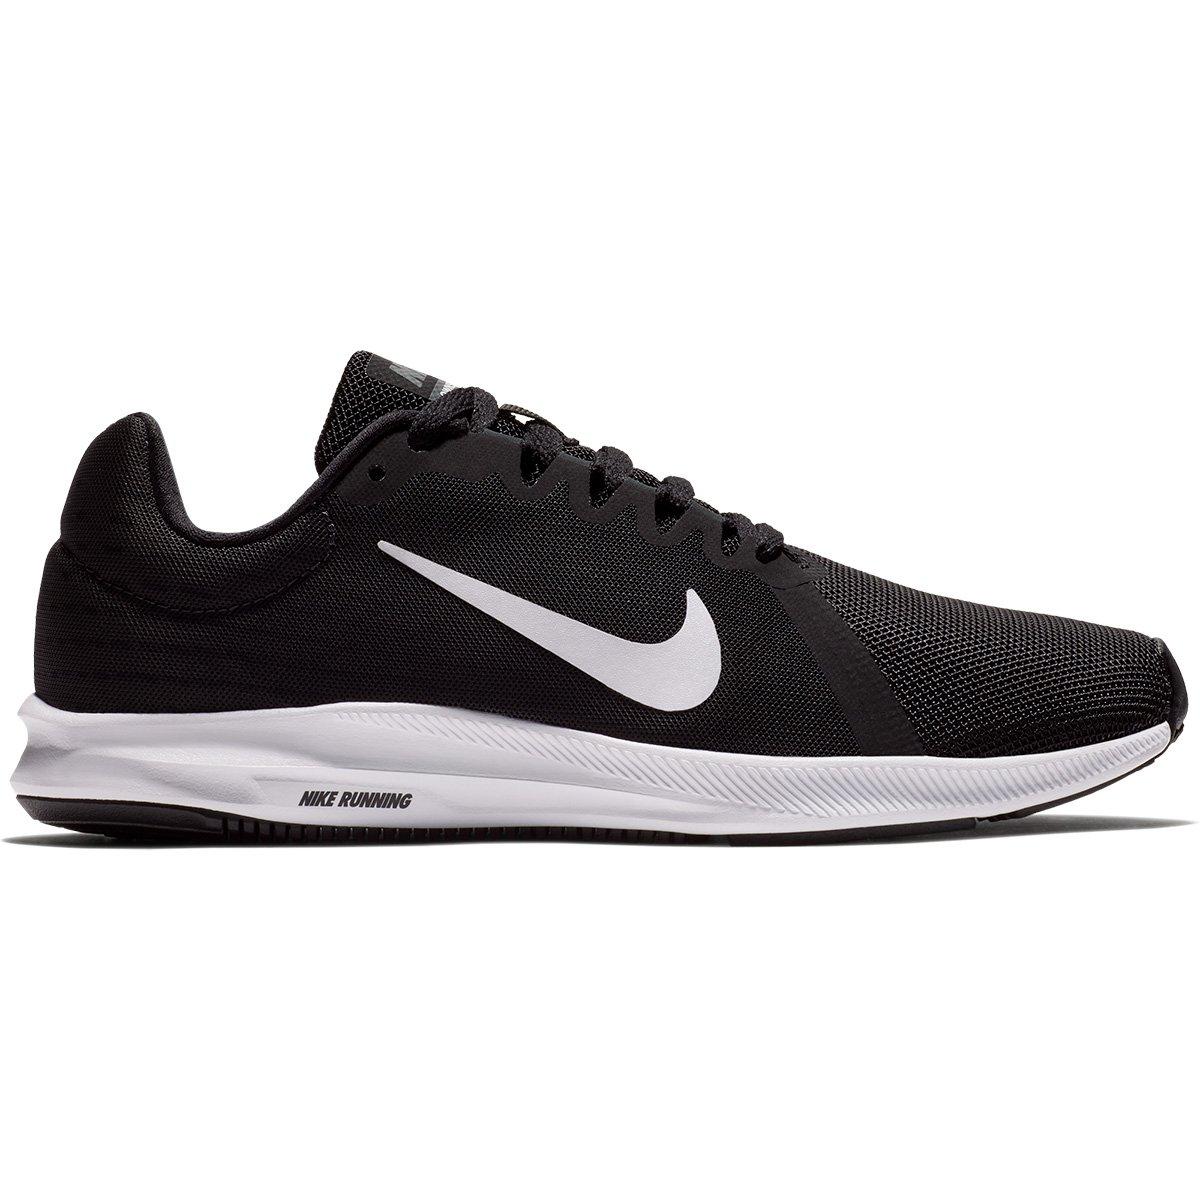 Tênis Nike Wmns Downshifter 8 Feminino - Preto e Branco - Compre ... c8cde4bee2